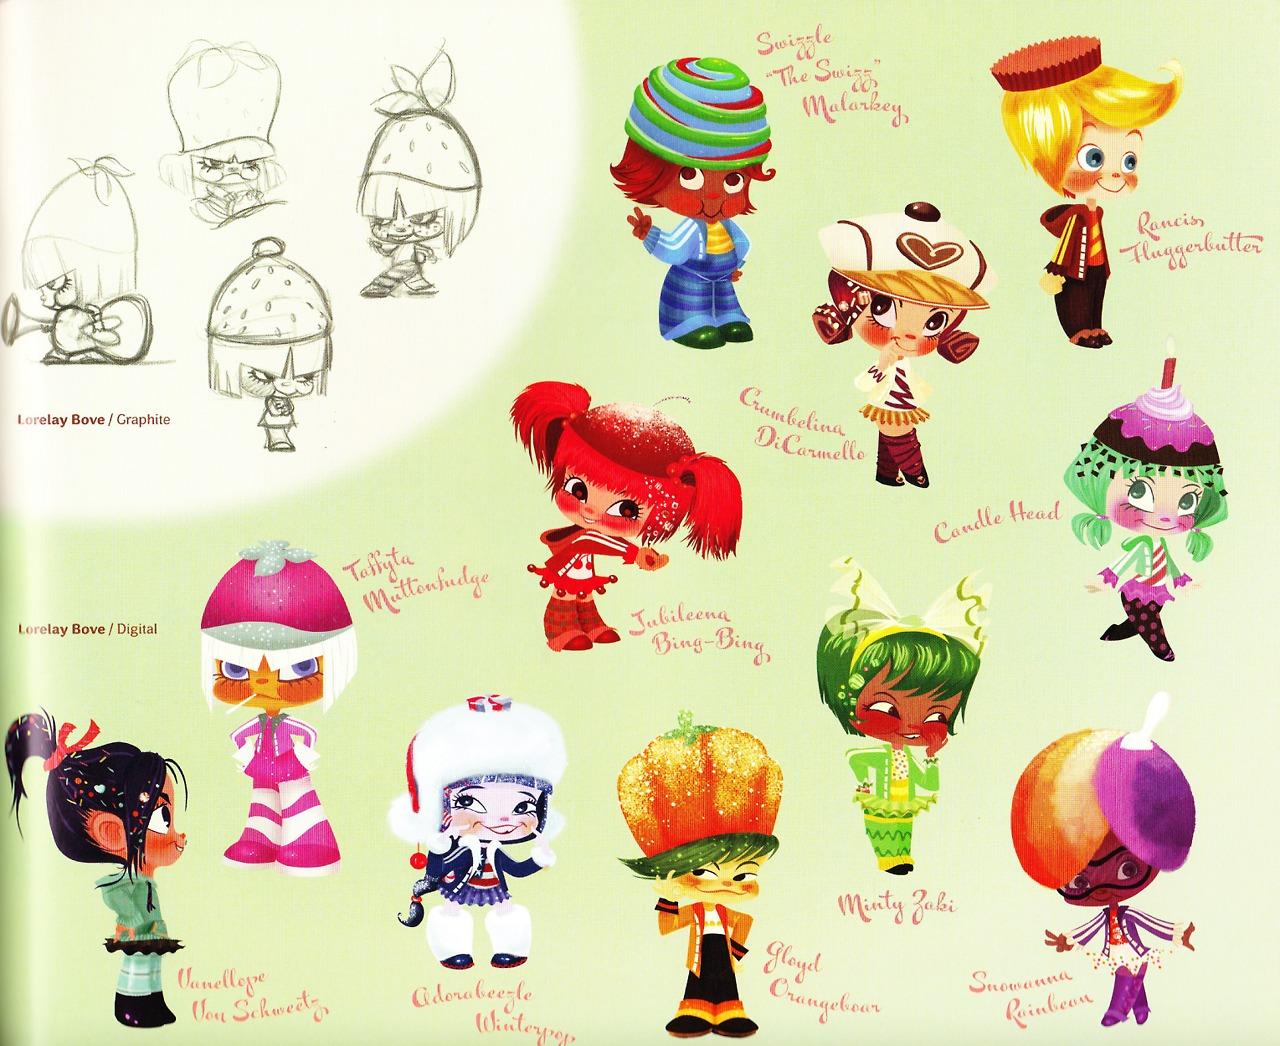 Wreck-It Ralph Sugar Rush Characters